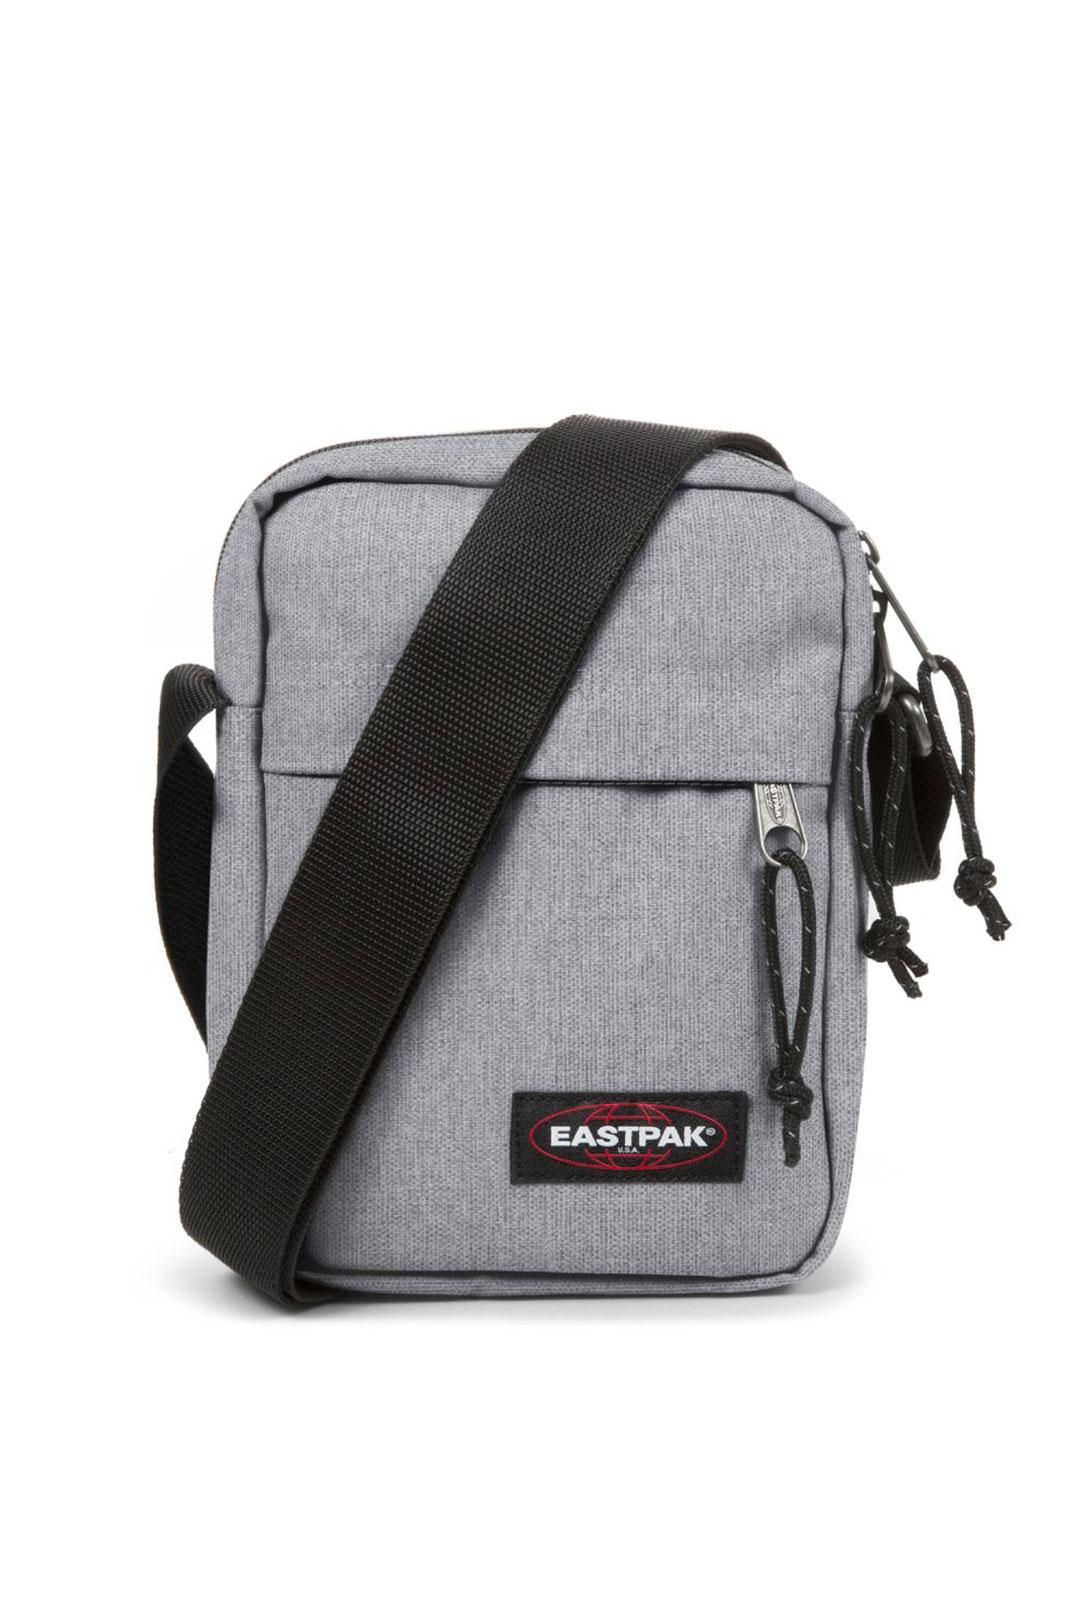 Sac porté épaule  Eastpak EK045363 THE ONE 363 gris